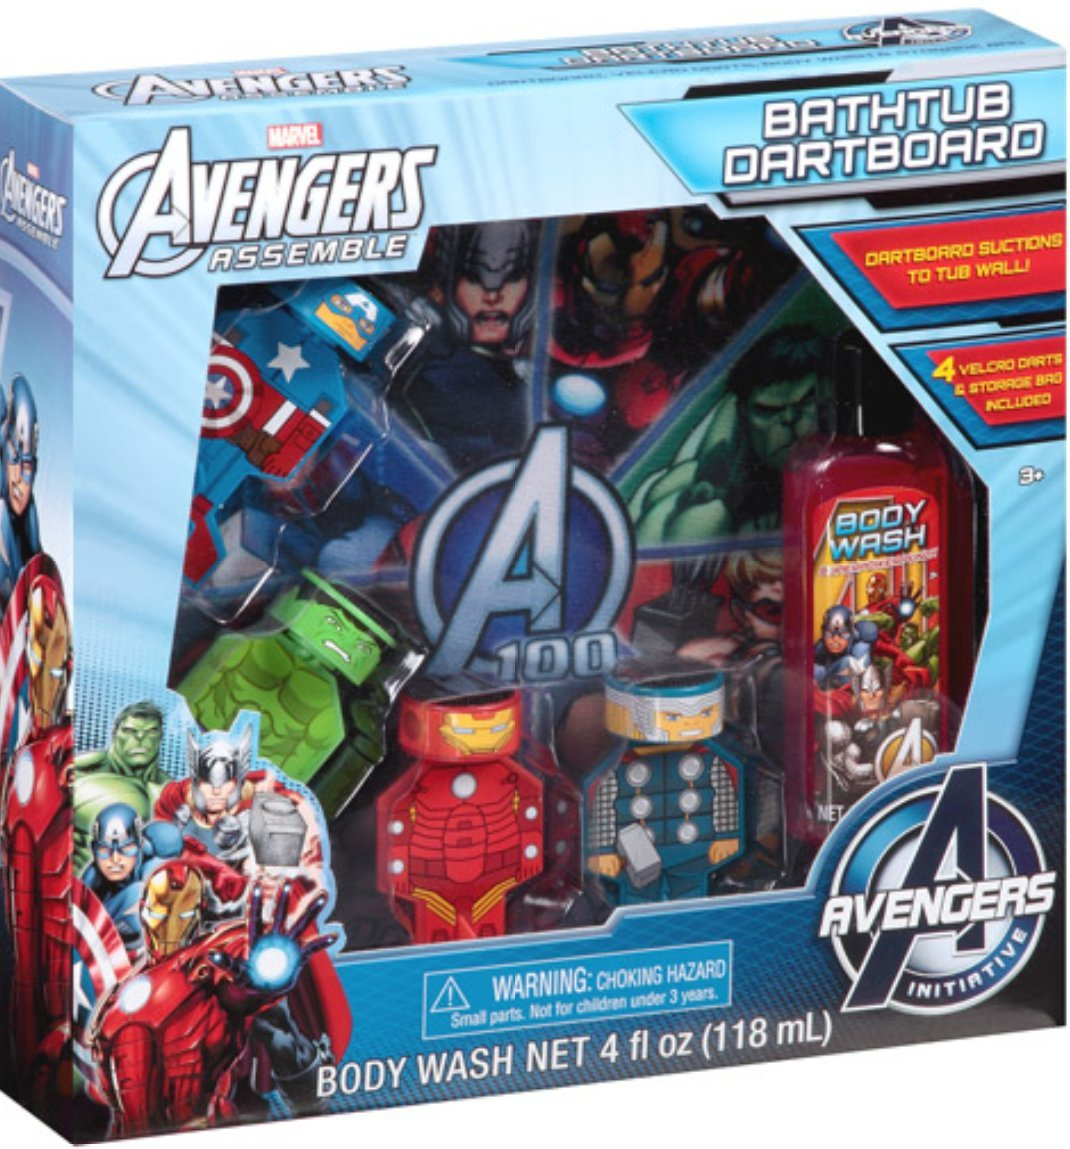 Marvel The Avengers Bathtub Dartboard Bath Gift Set: Amazon.co.uk ...